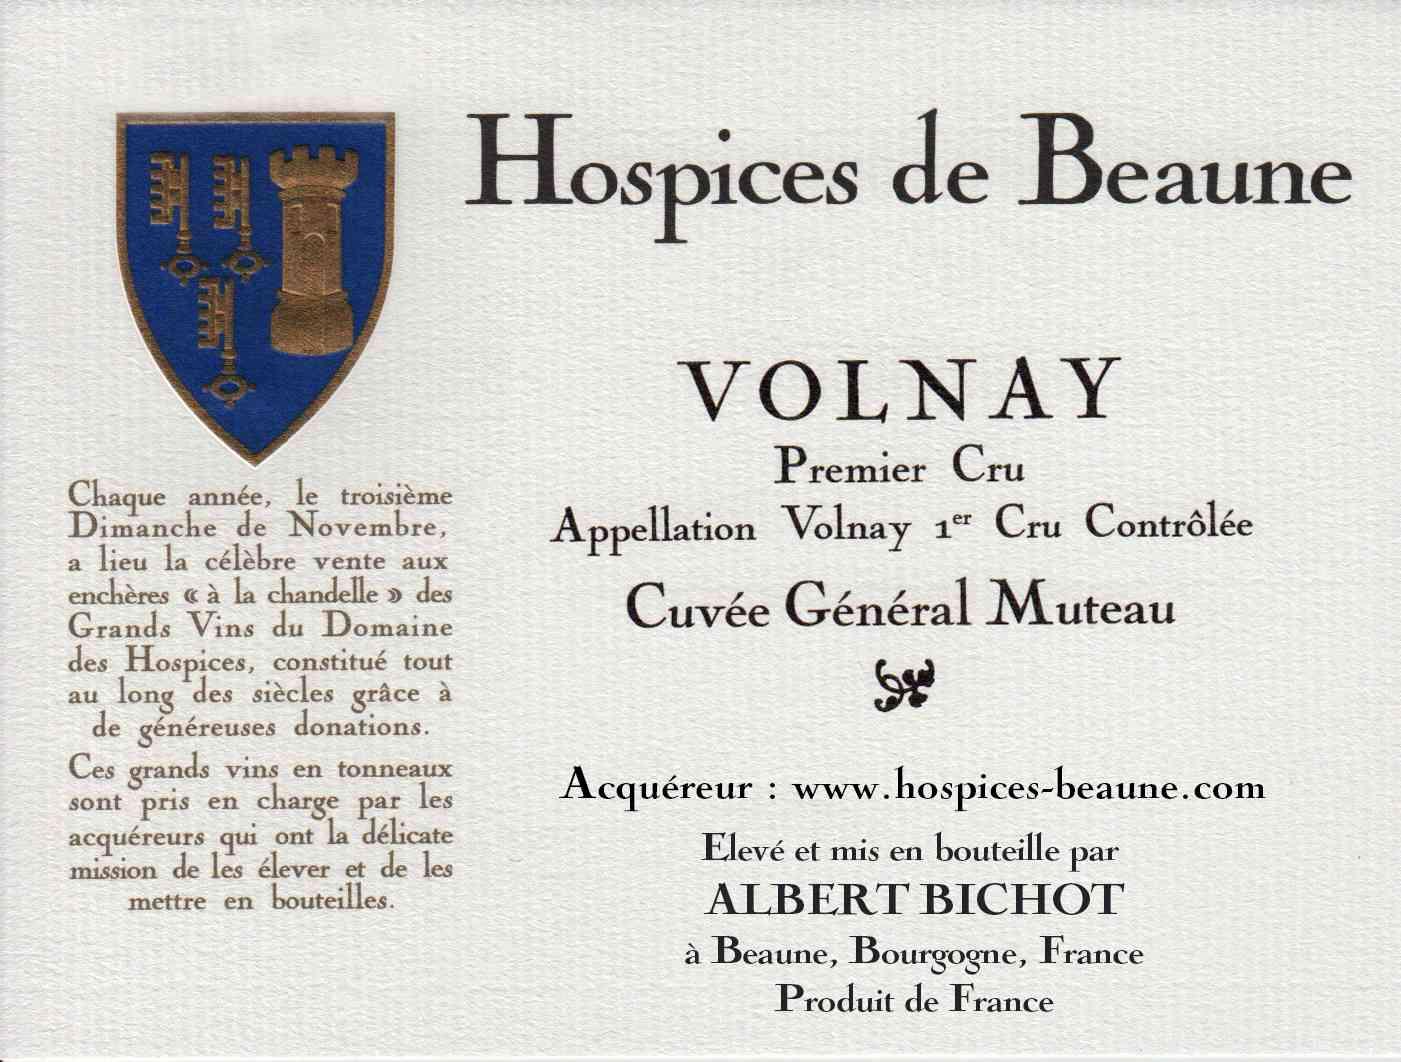 Encheres-auction-HospicesdeBeaune-AlbertBichot-Volnay-PremierCru-Cuvee-GeneralMuteau